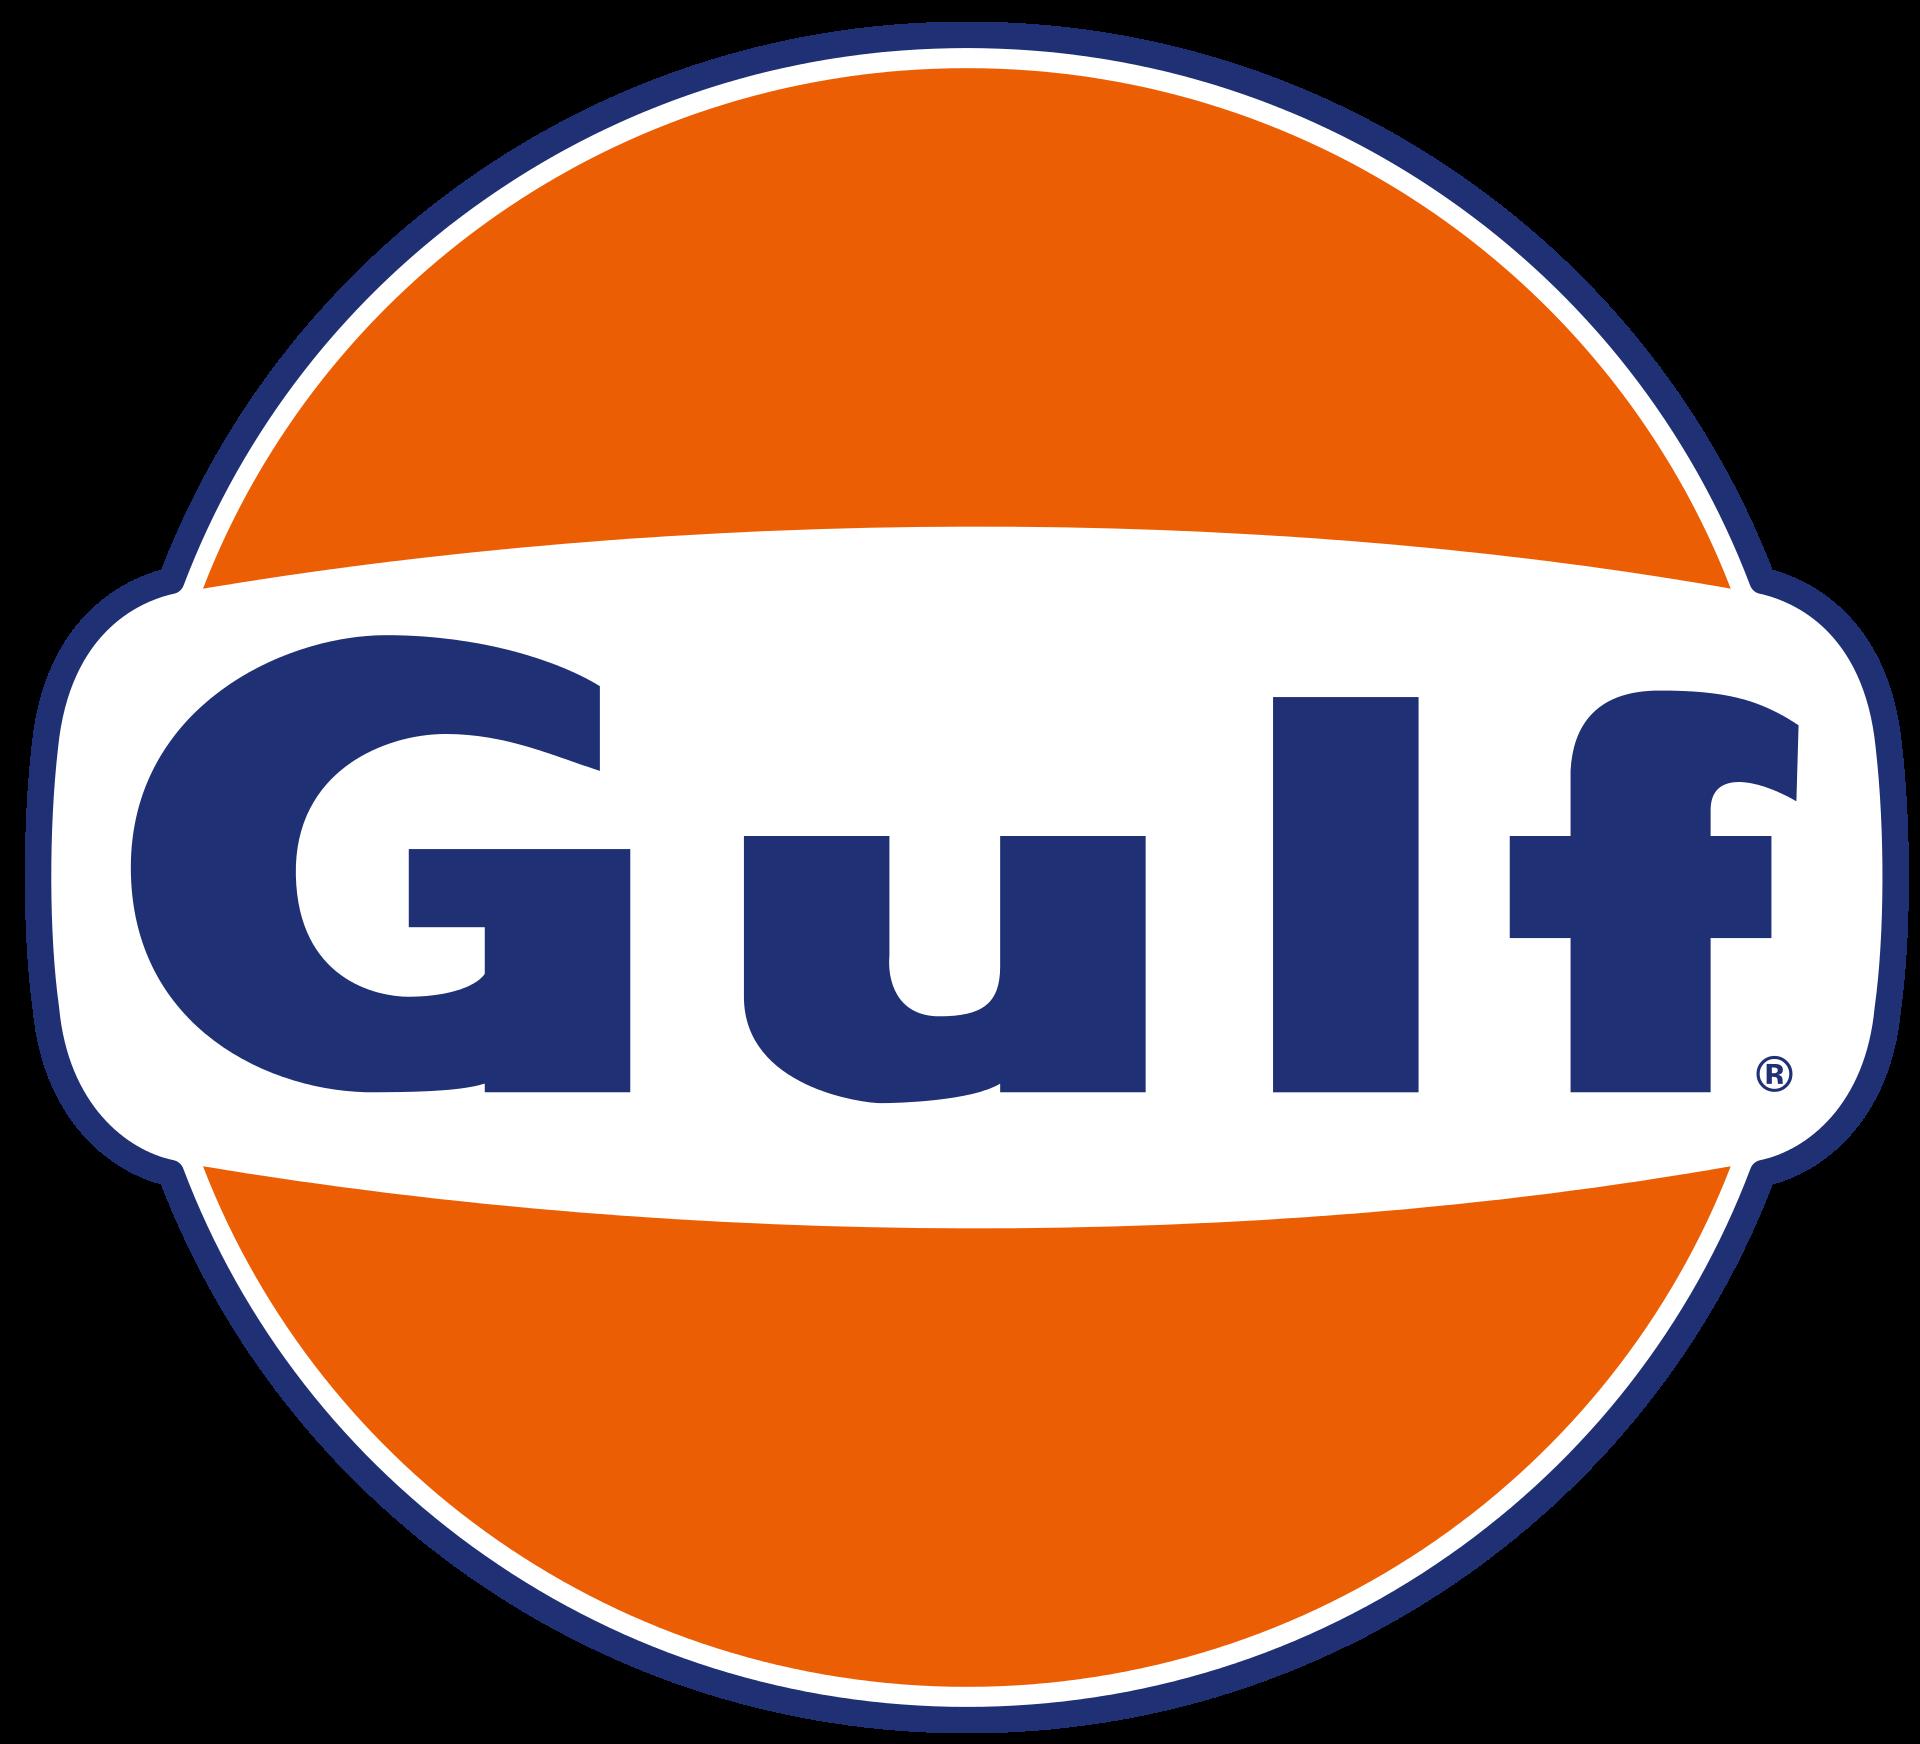 Gulf Nol